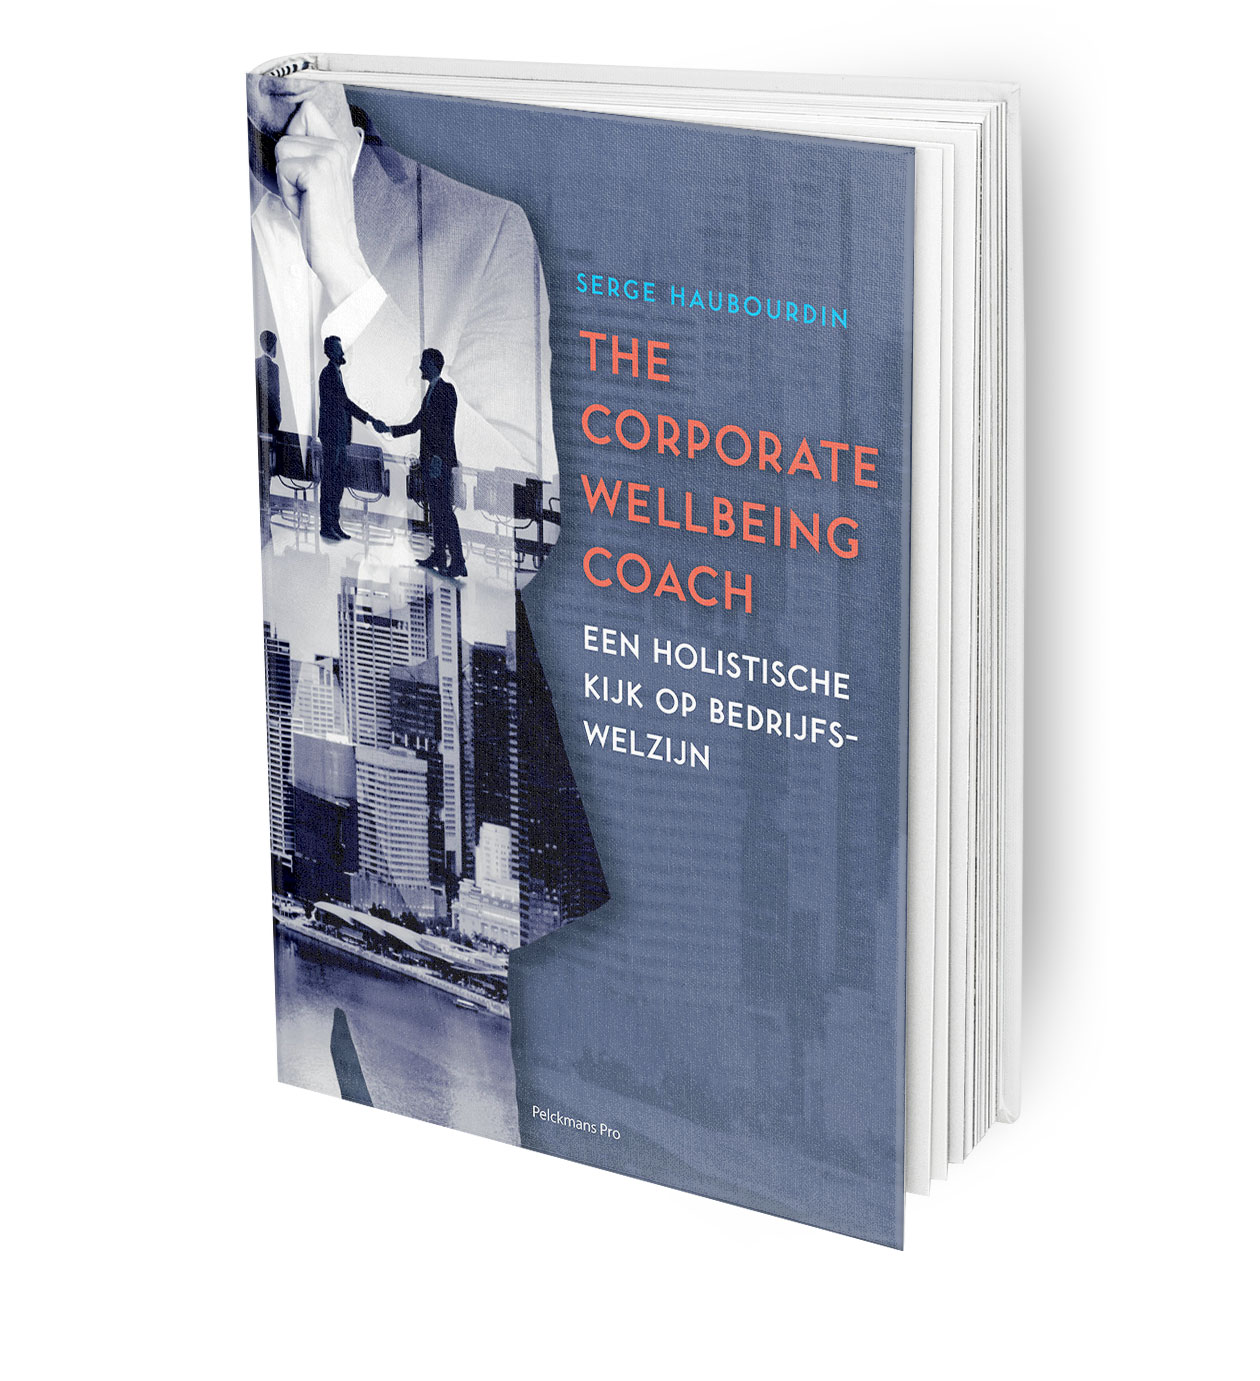 corporate wellbeing, corporate coach, serge haubourdin, the corporate wellbeing coach